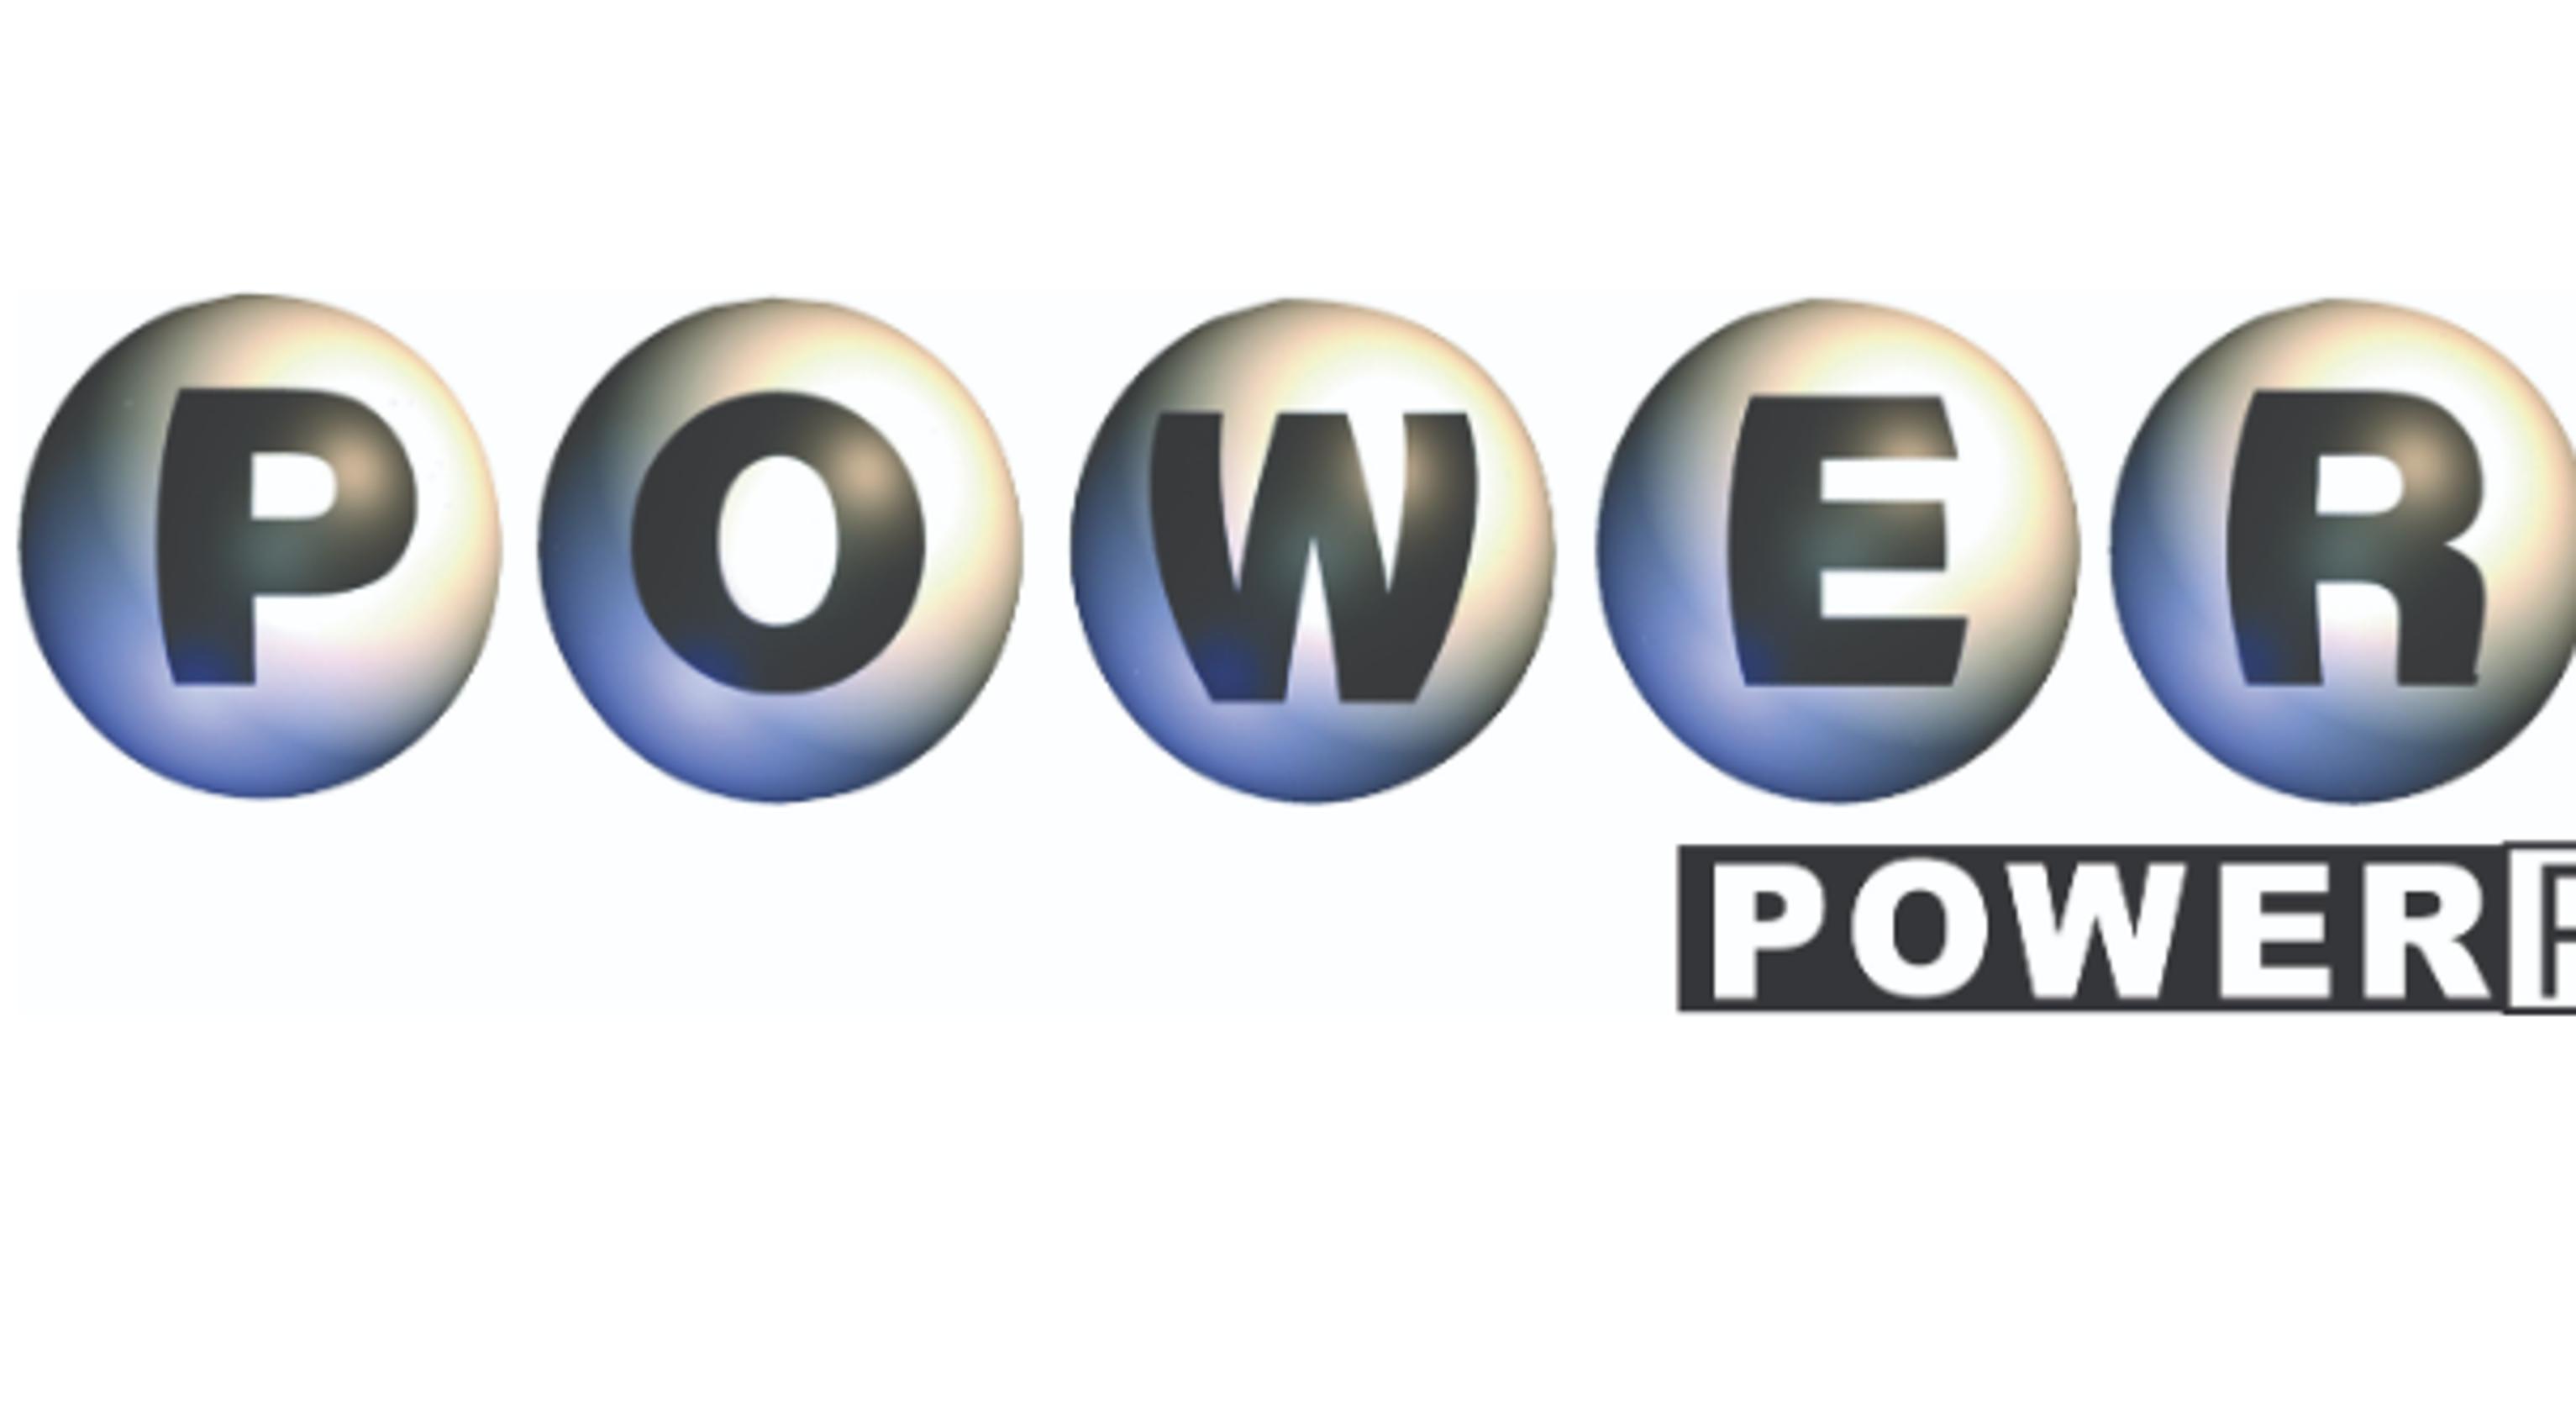 Million Dollar Powerball Lottery Ticket Sold In Iola At Depot Street